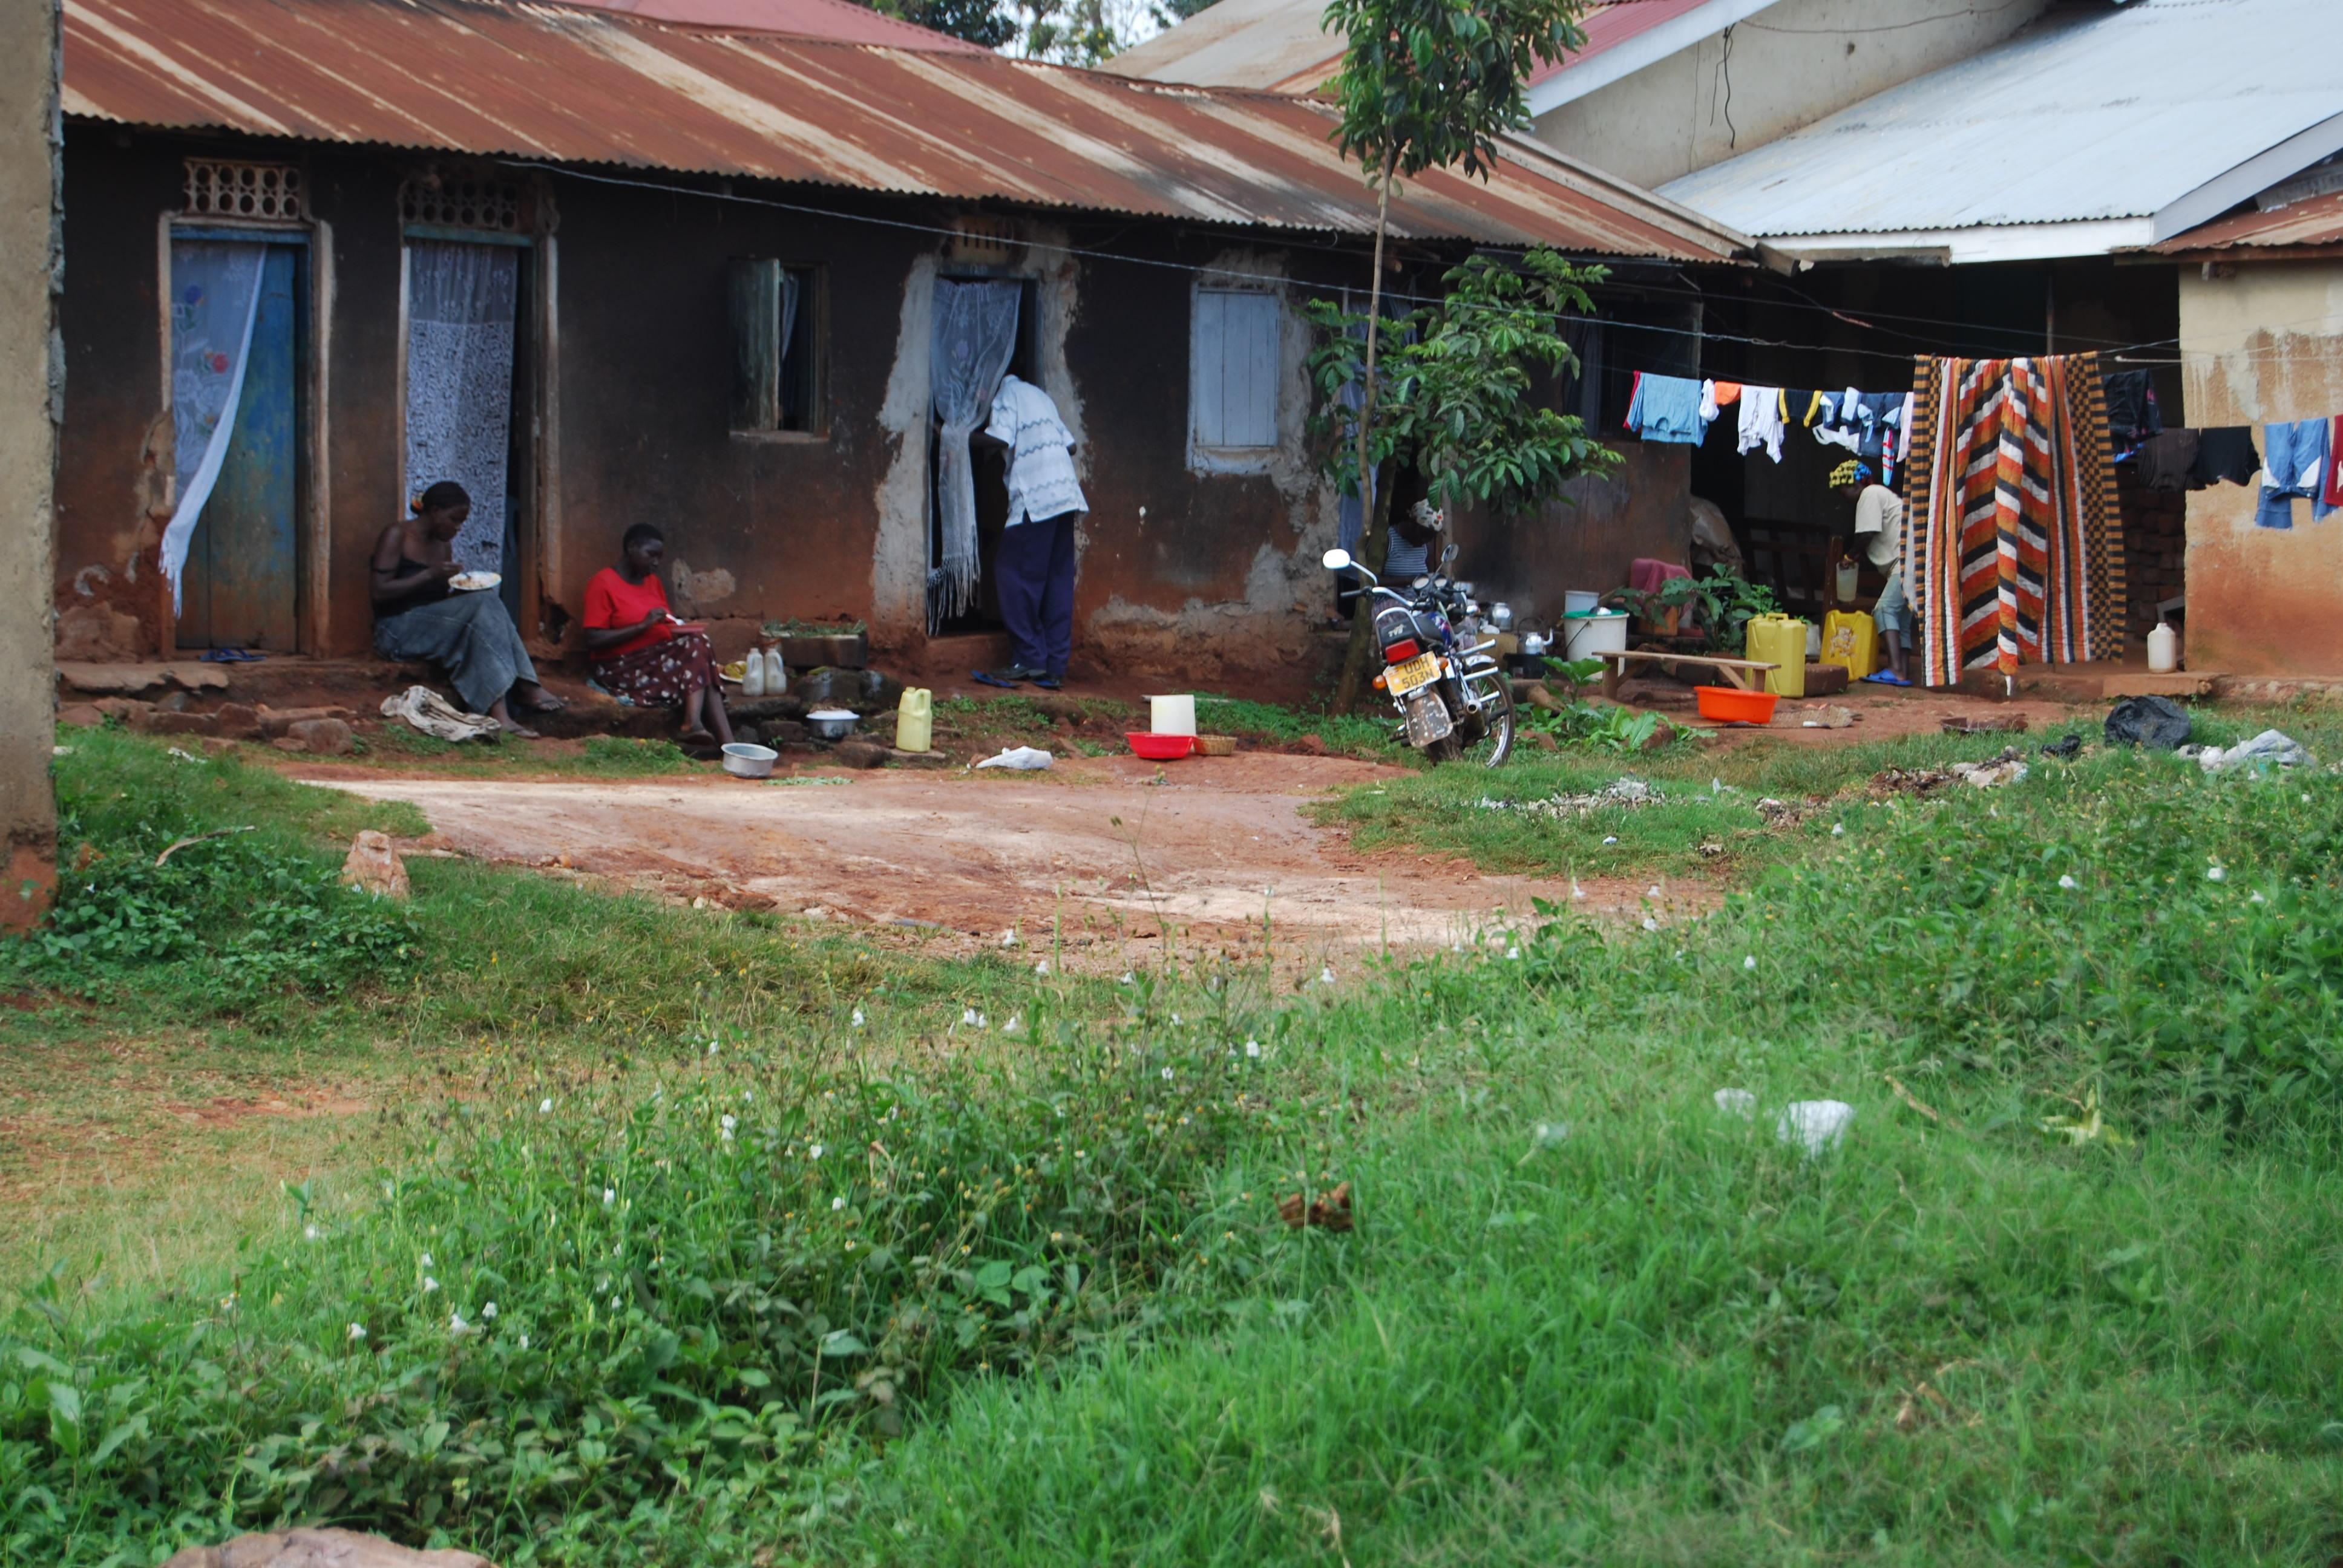 Mbuya slum, Kampala Uganda